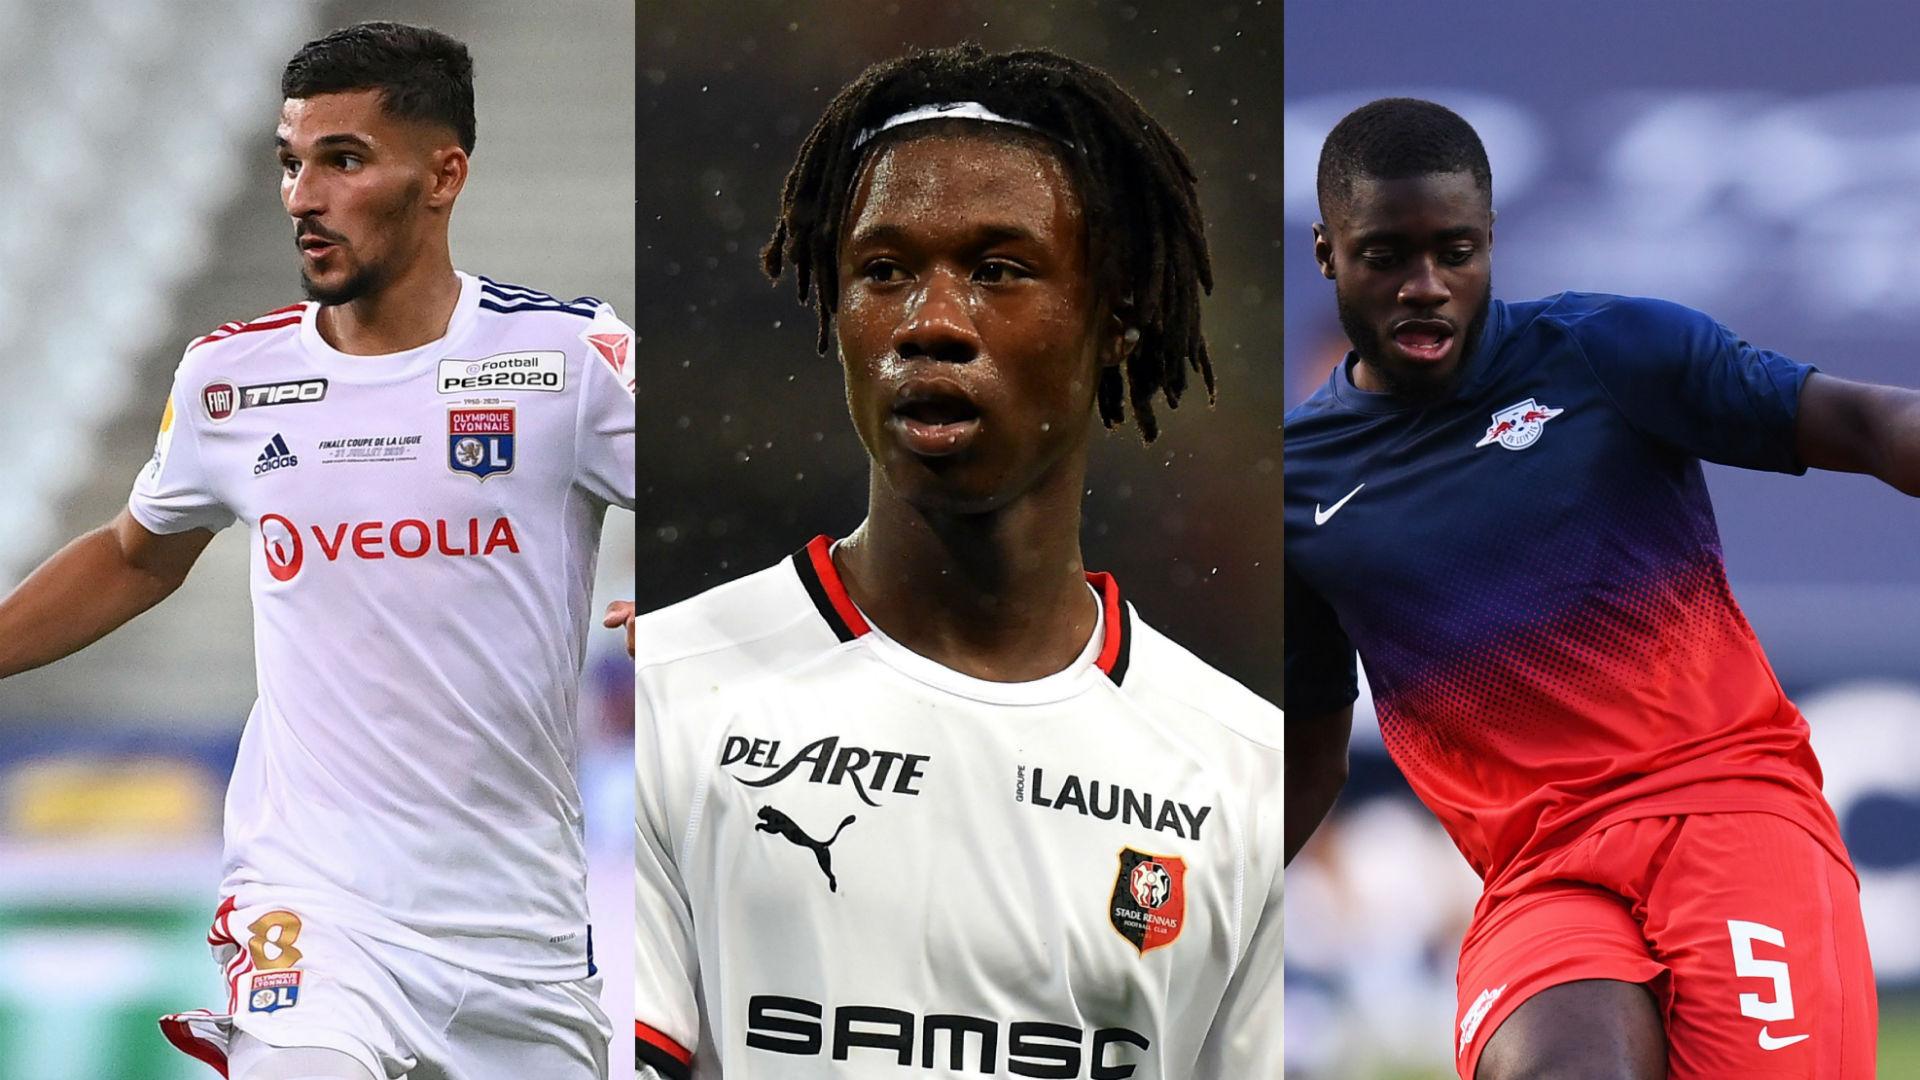 France boss Deschamps reveals reasons for selecting Aouar, Camvinga and Upamecano